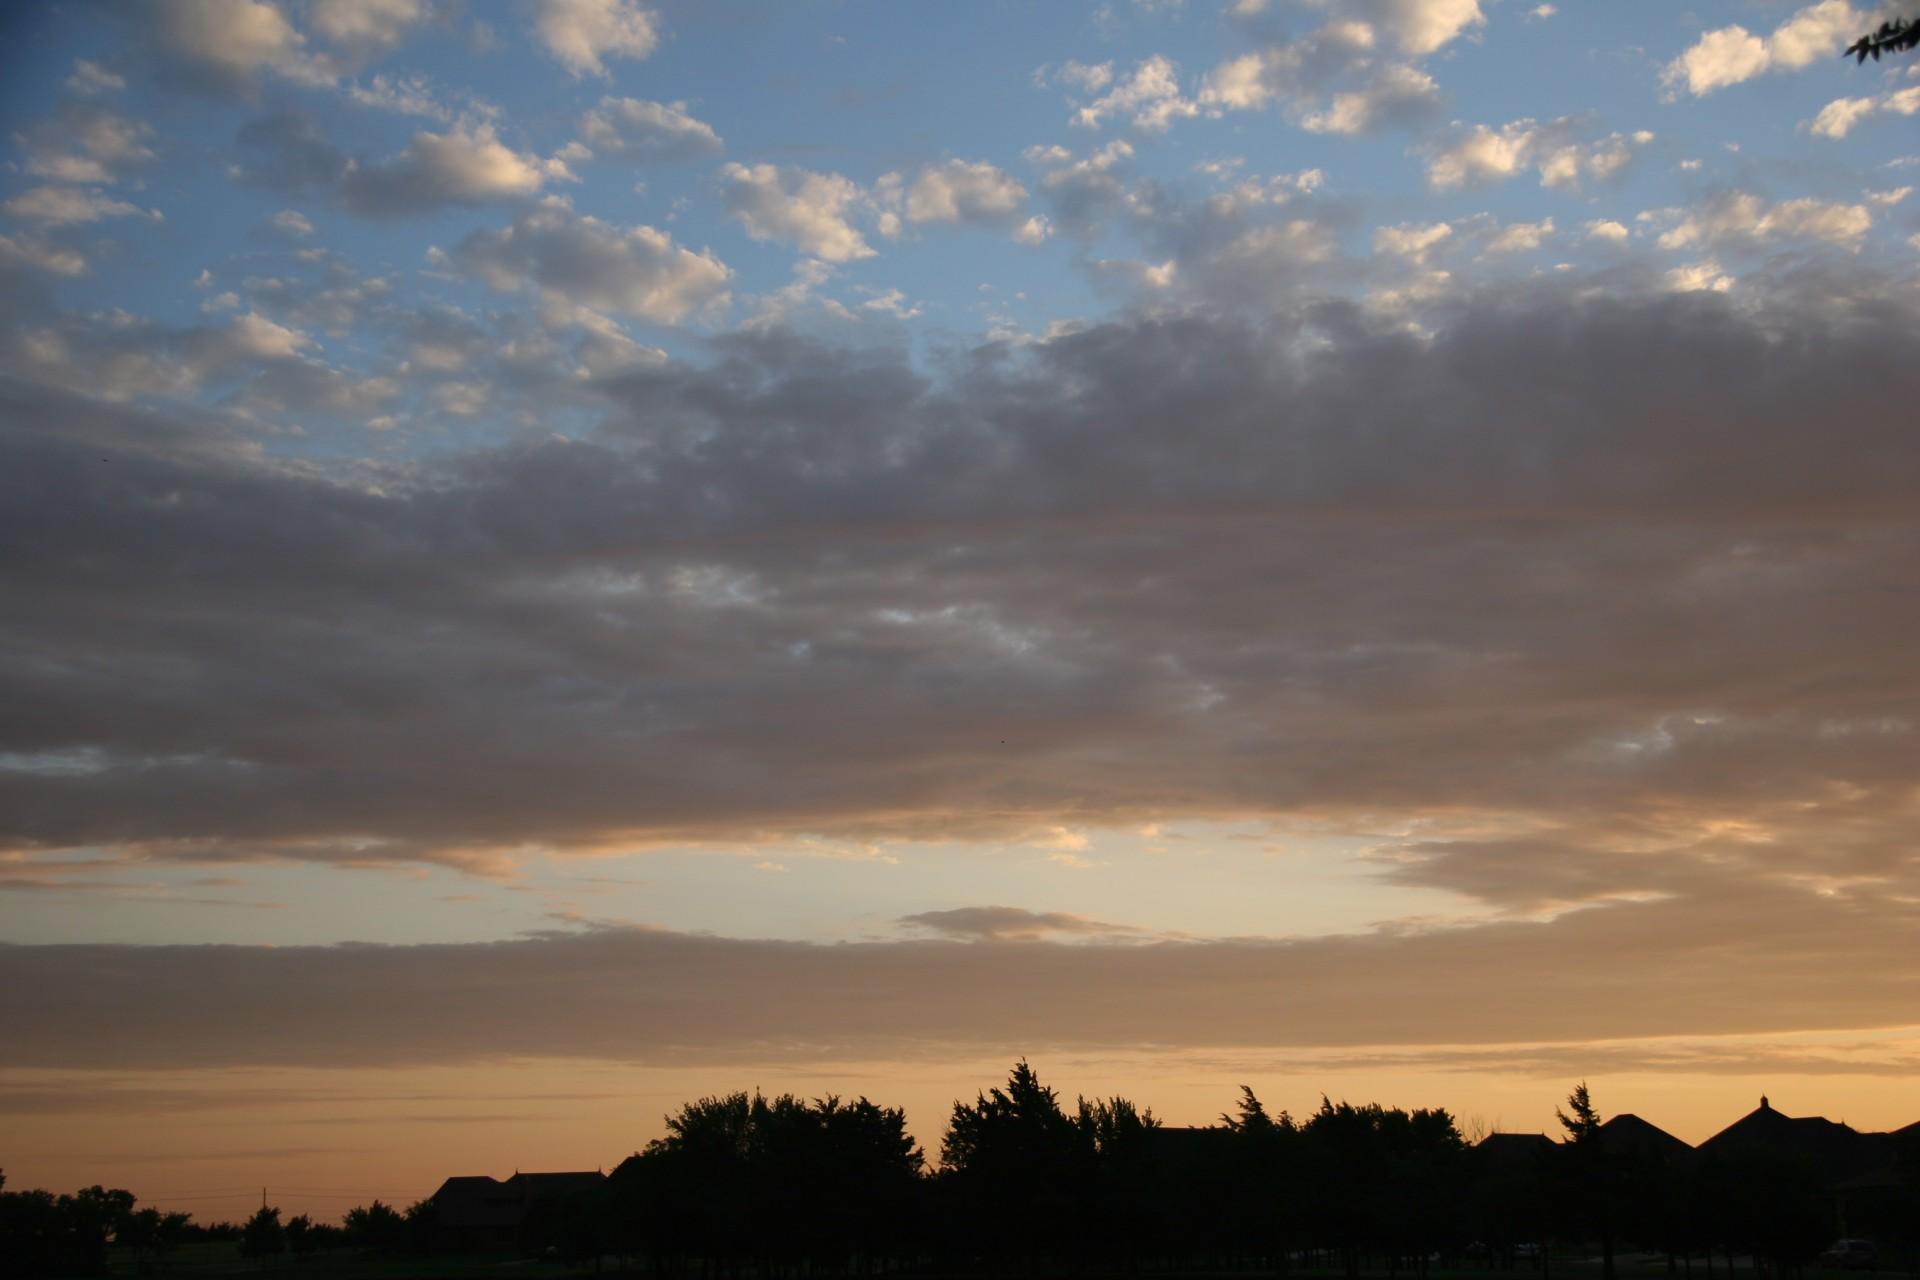 nightfall-sky